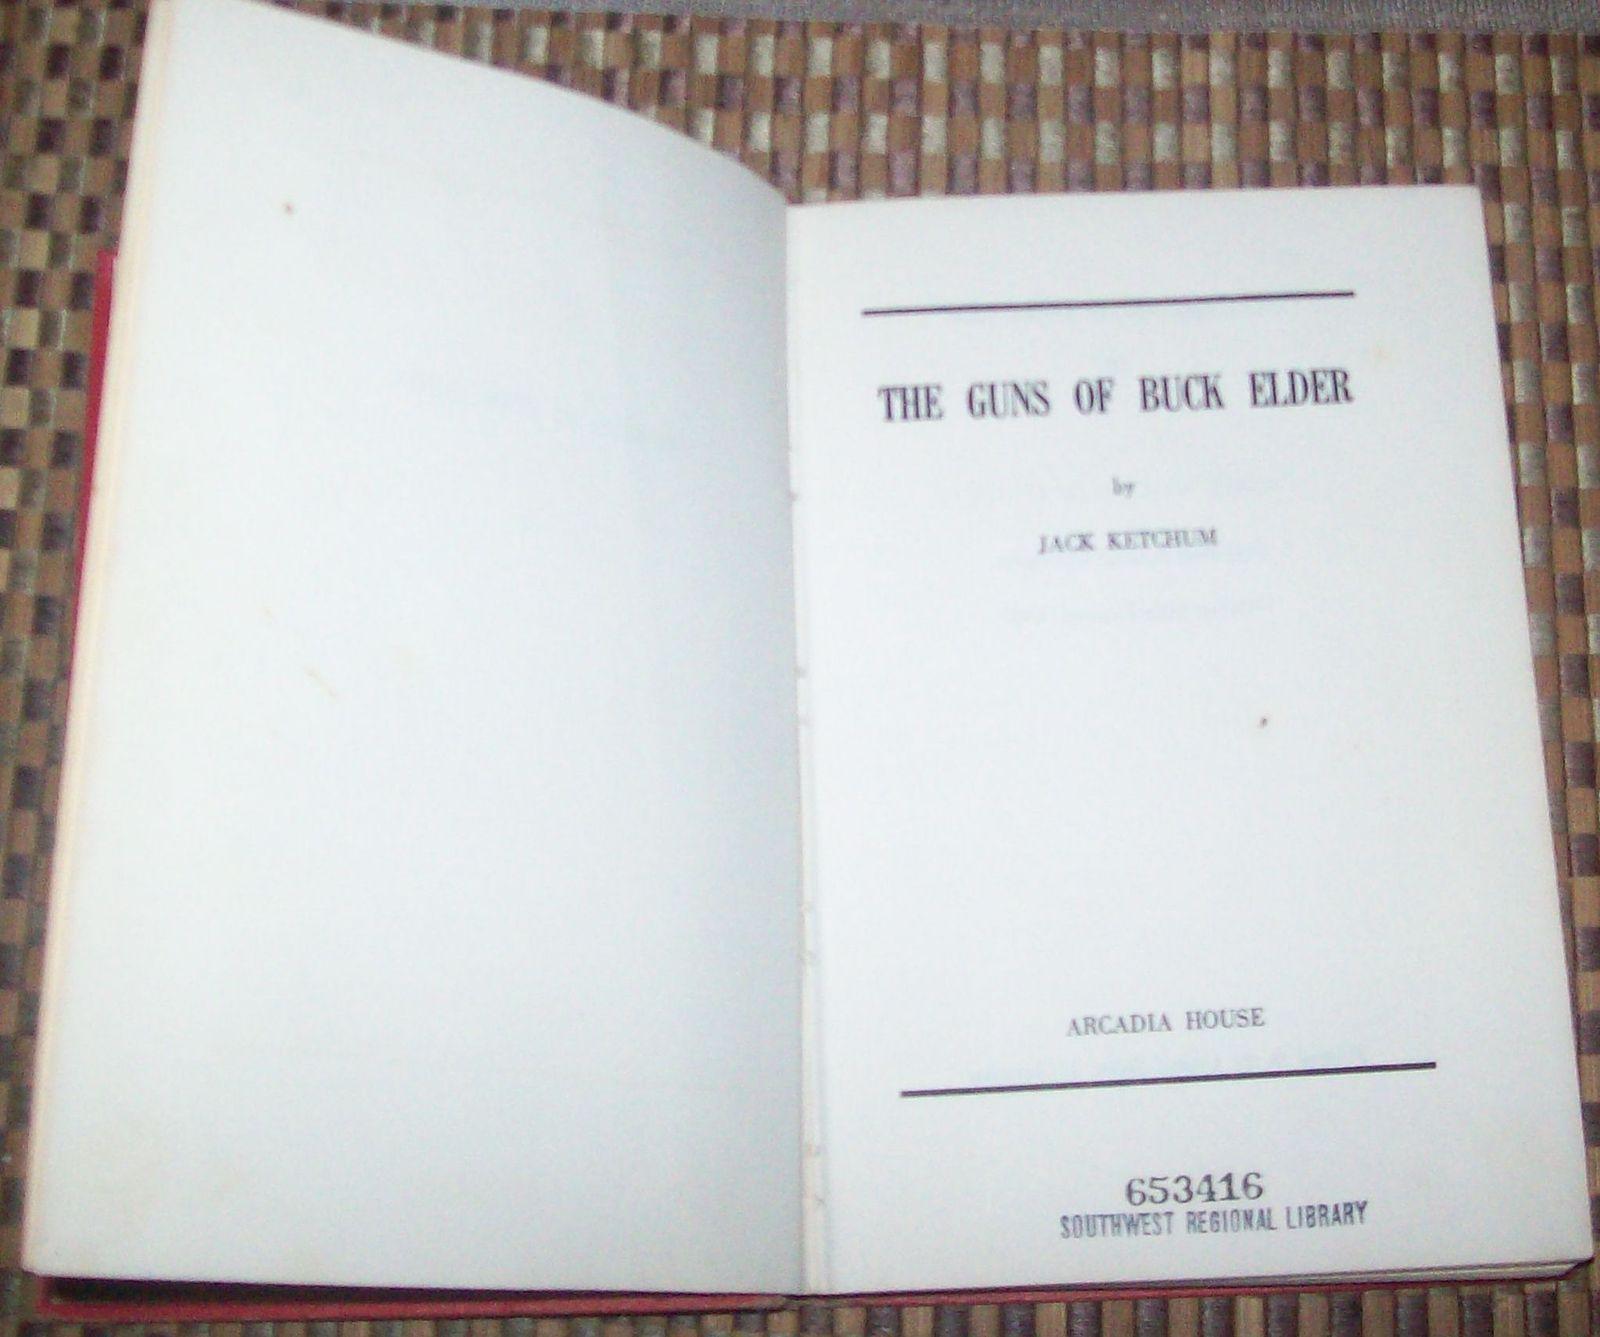 The Guns of Buck Elder by Jack Ketchum 1967 HBDJ